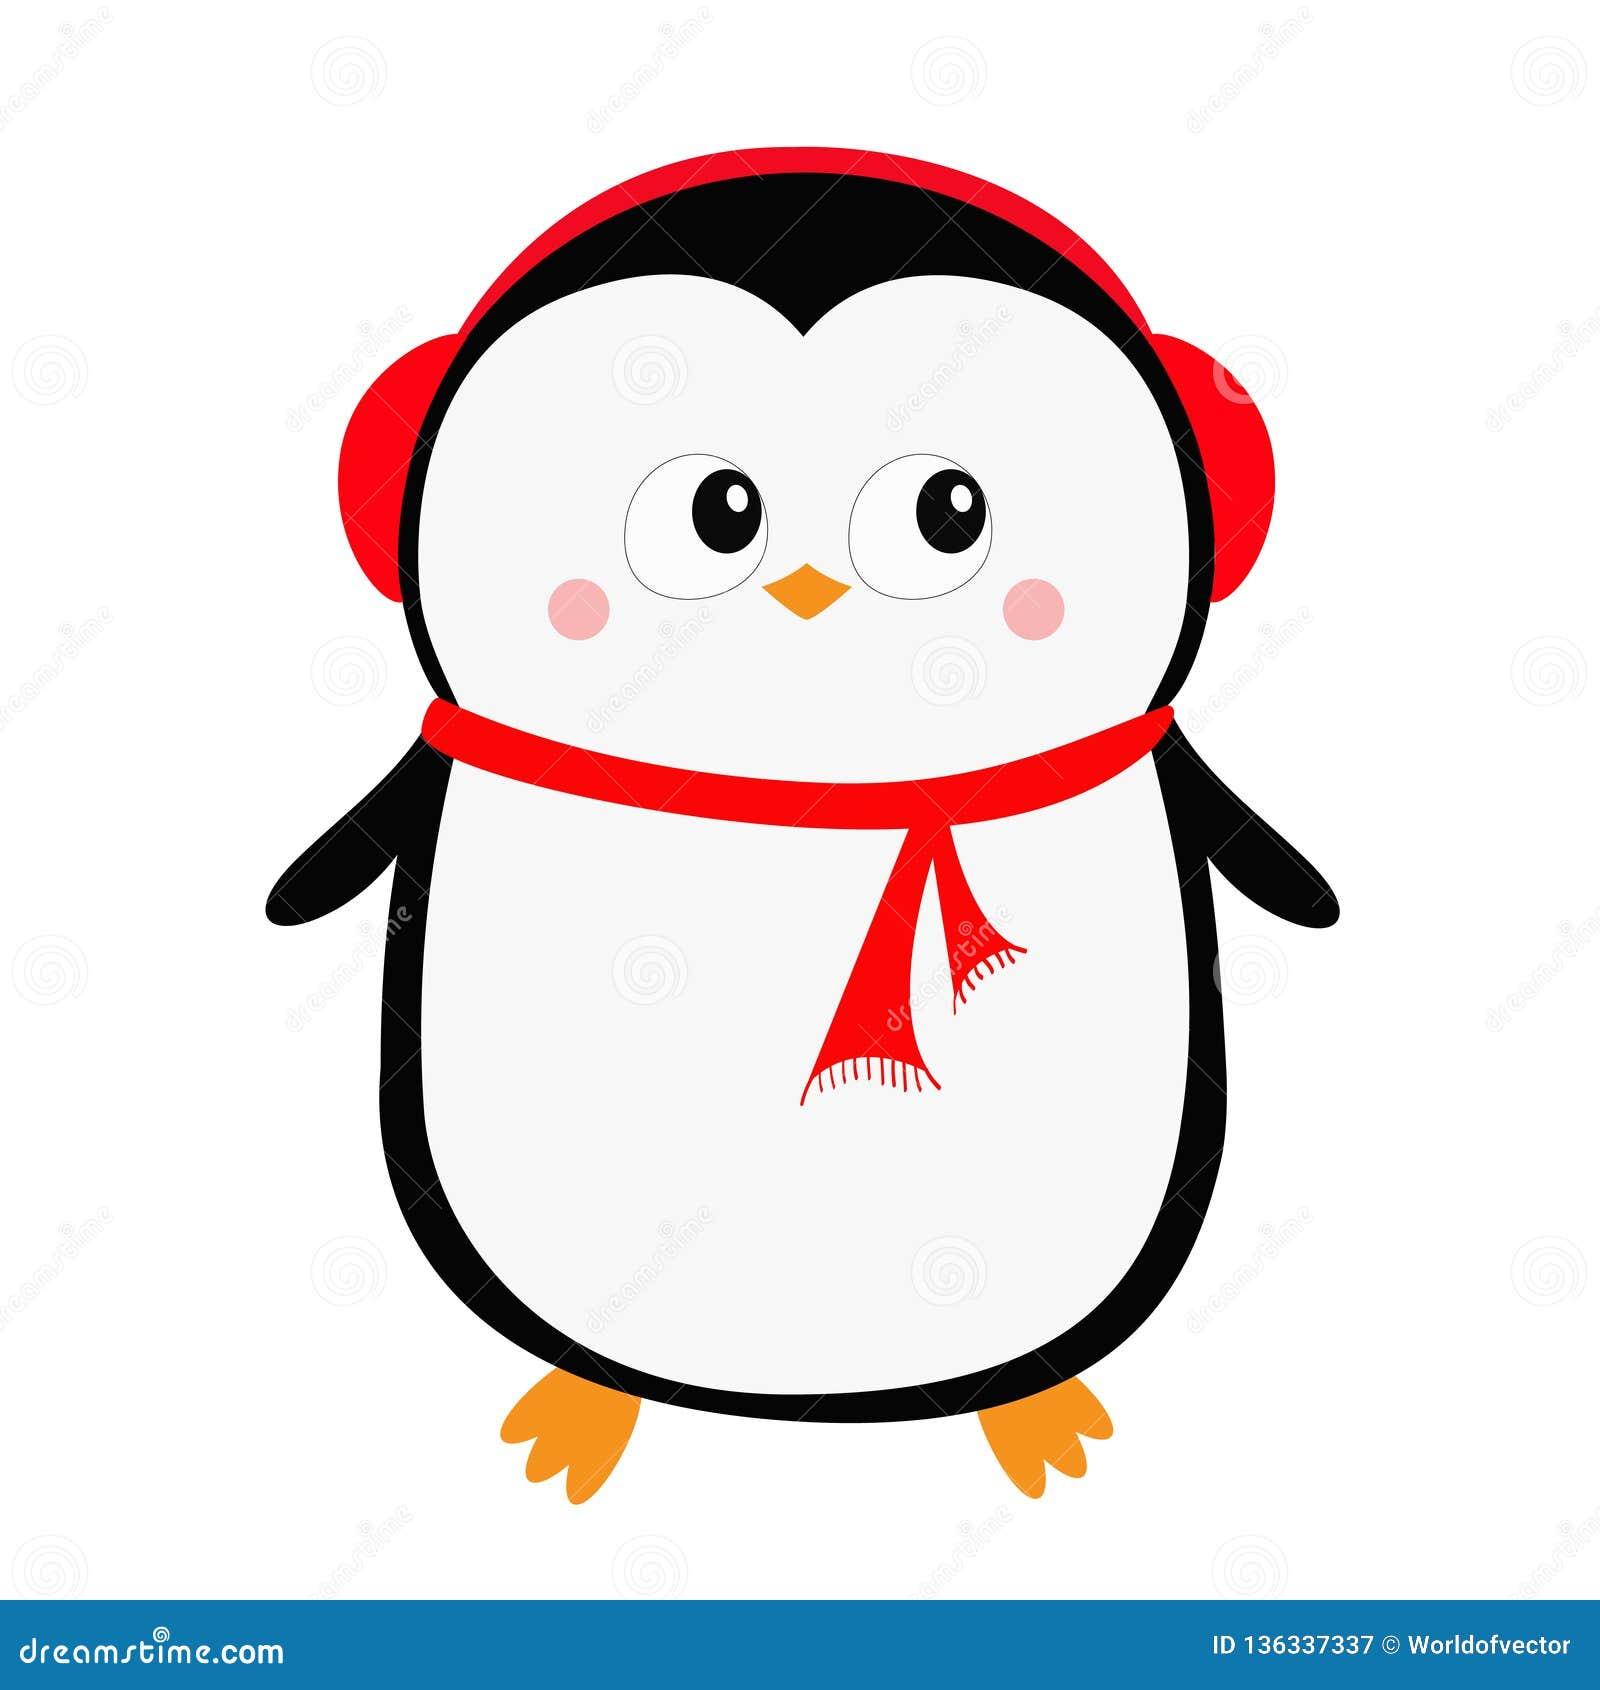 e8dbaff9f9b7d Merry Christmas. Cute cartoon kawaii baby character. Arctic animal. Flat  design. Hello winter. Isolated. White background. Vector illustration